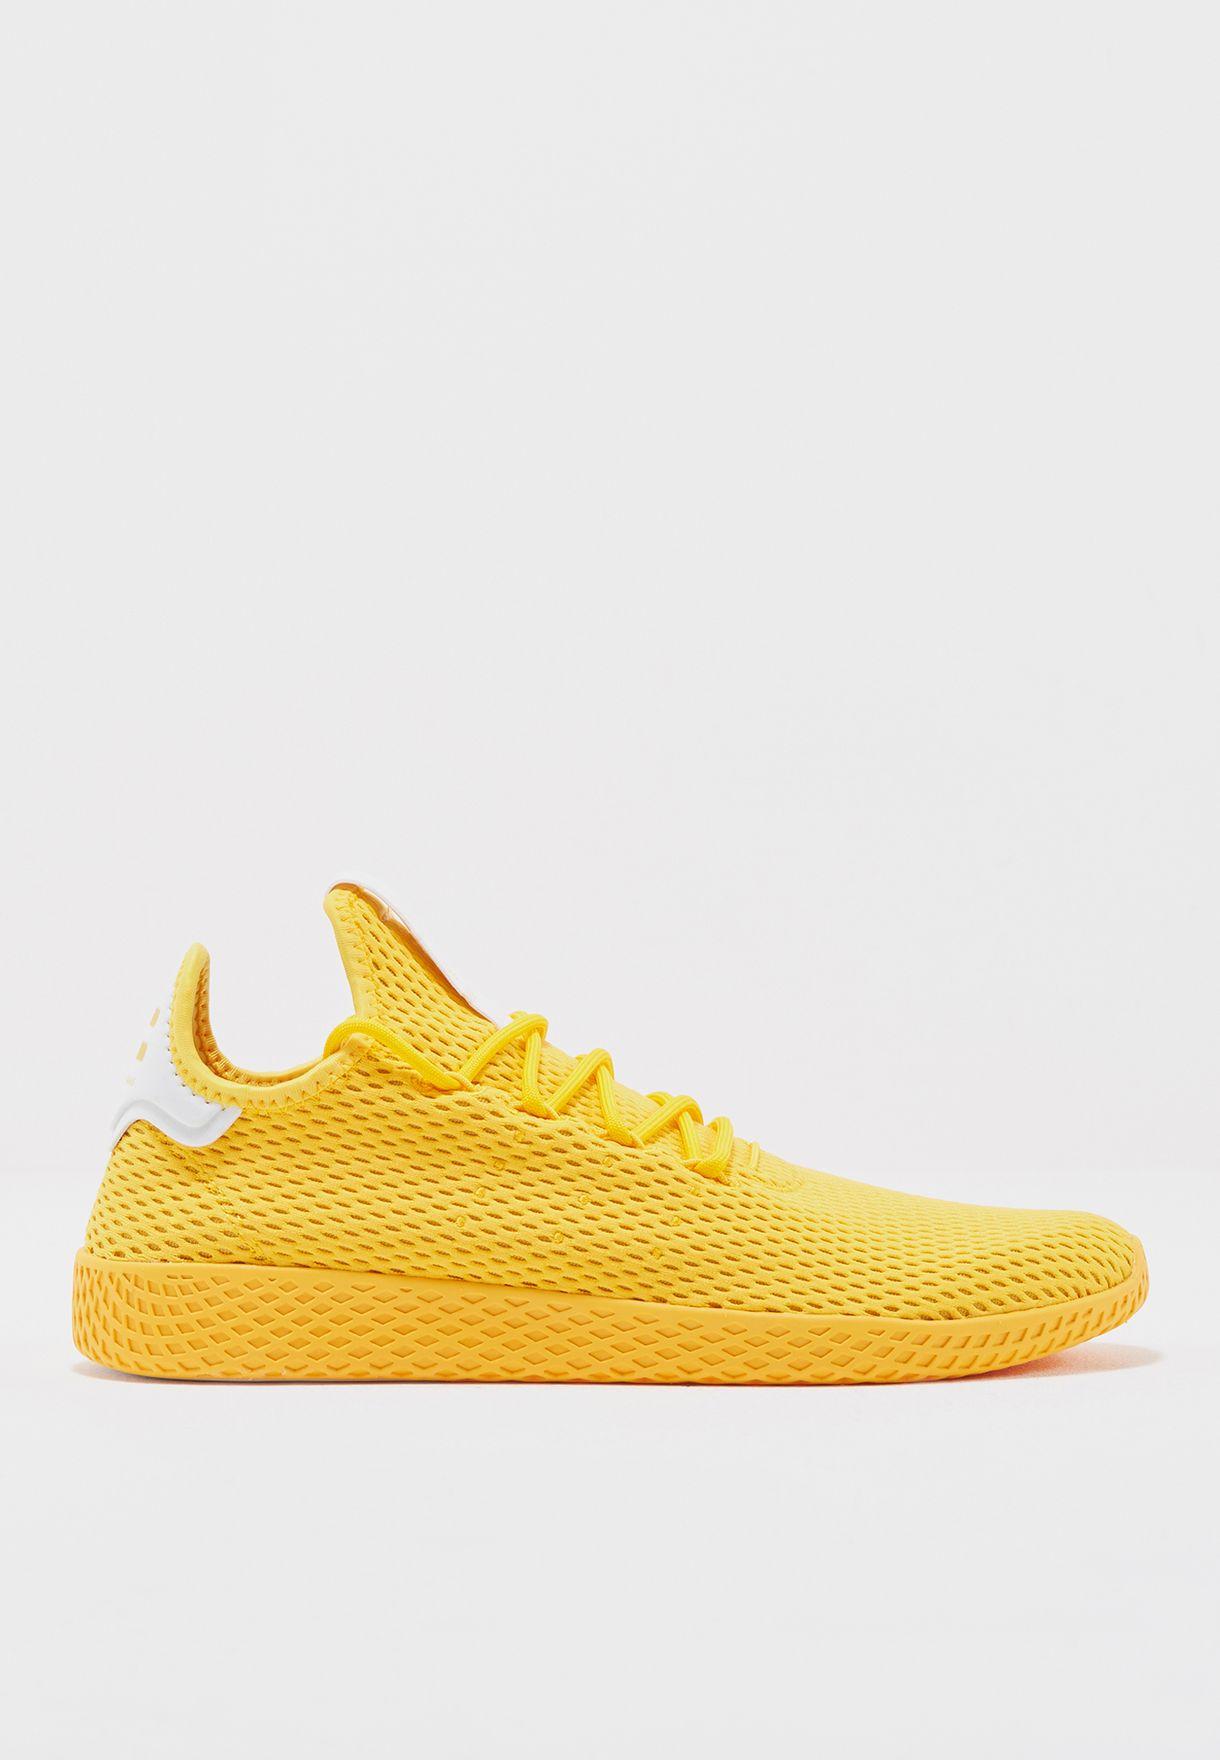 c151b46f0 تسوق حذاء تنس من مجموعة فاريل وليامز ماركة اديداس اورجينال لون أصفر ...